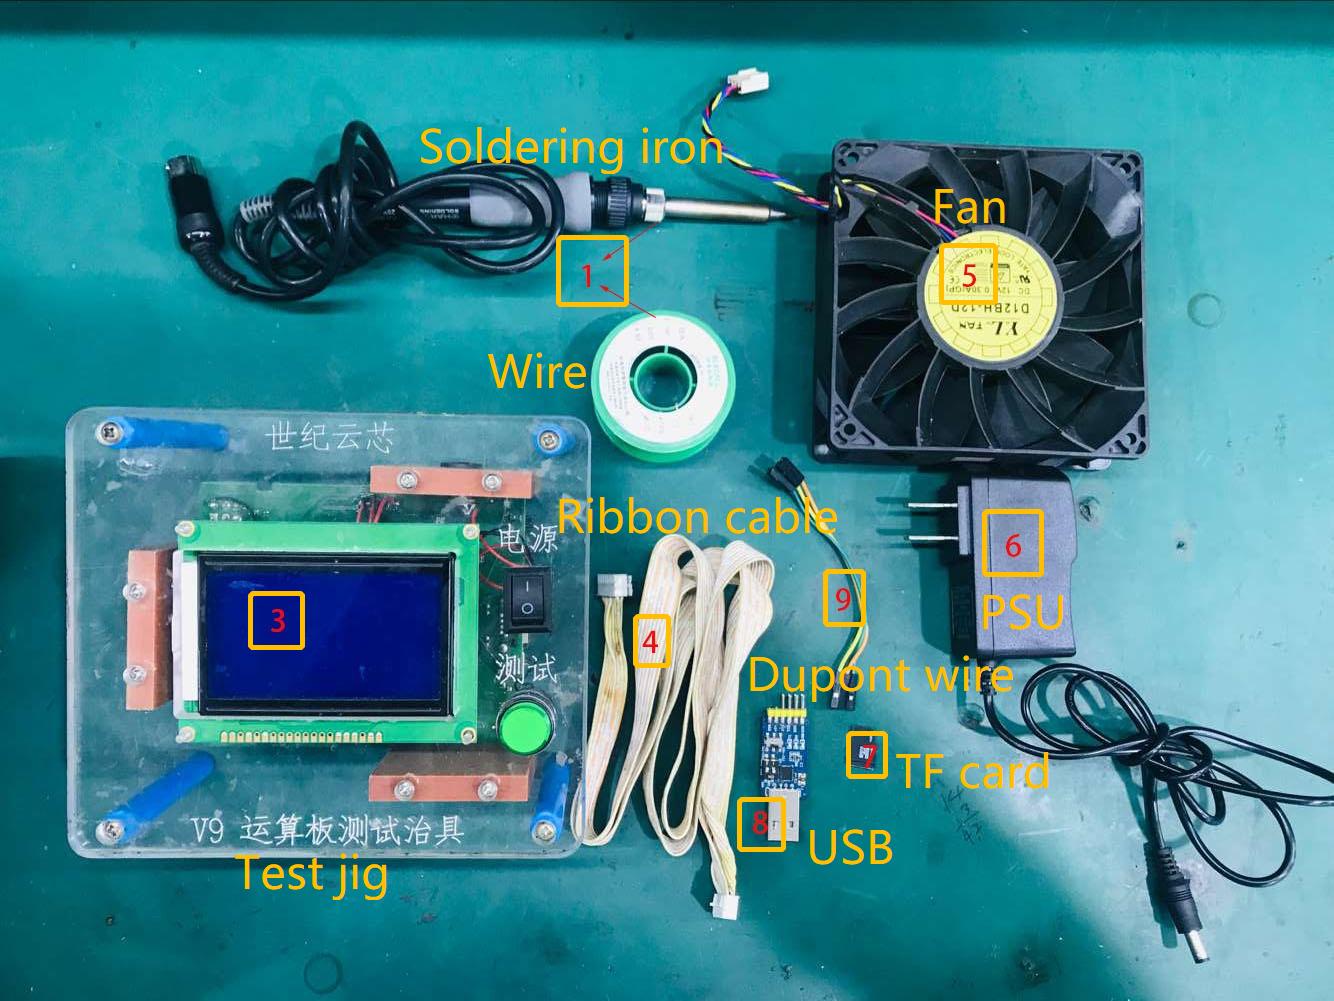 How to set up V9 V1.0 test jig manual for S9, S9i, S9j, R4 ... V Usb Wiring Schematic on